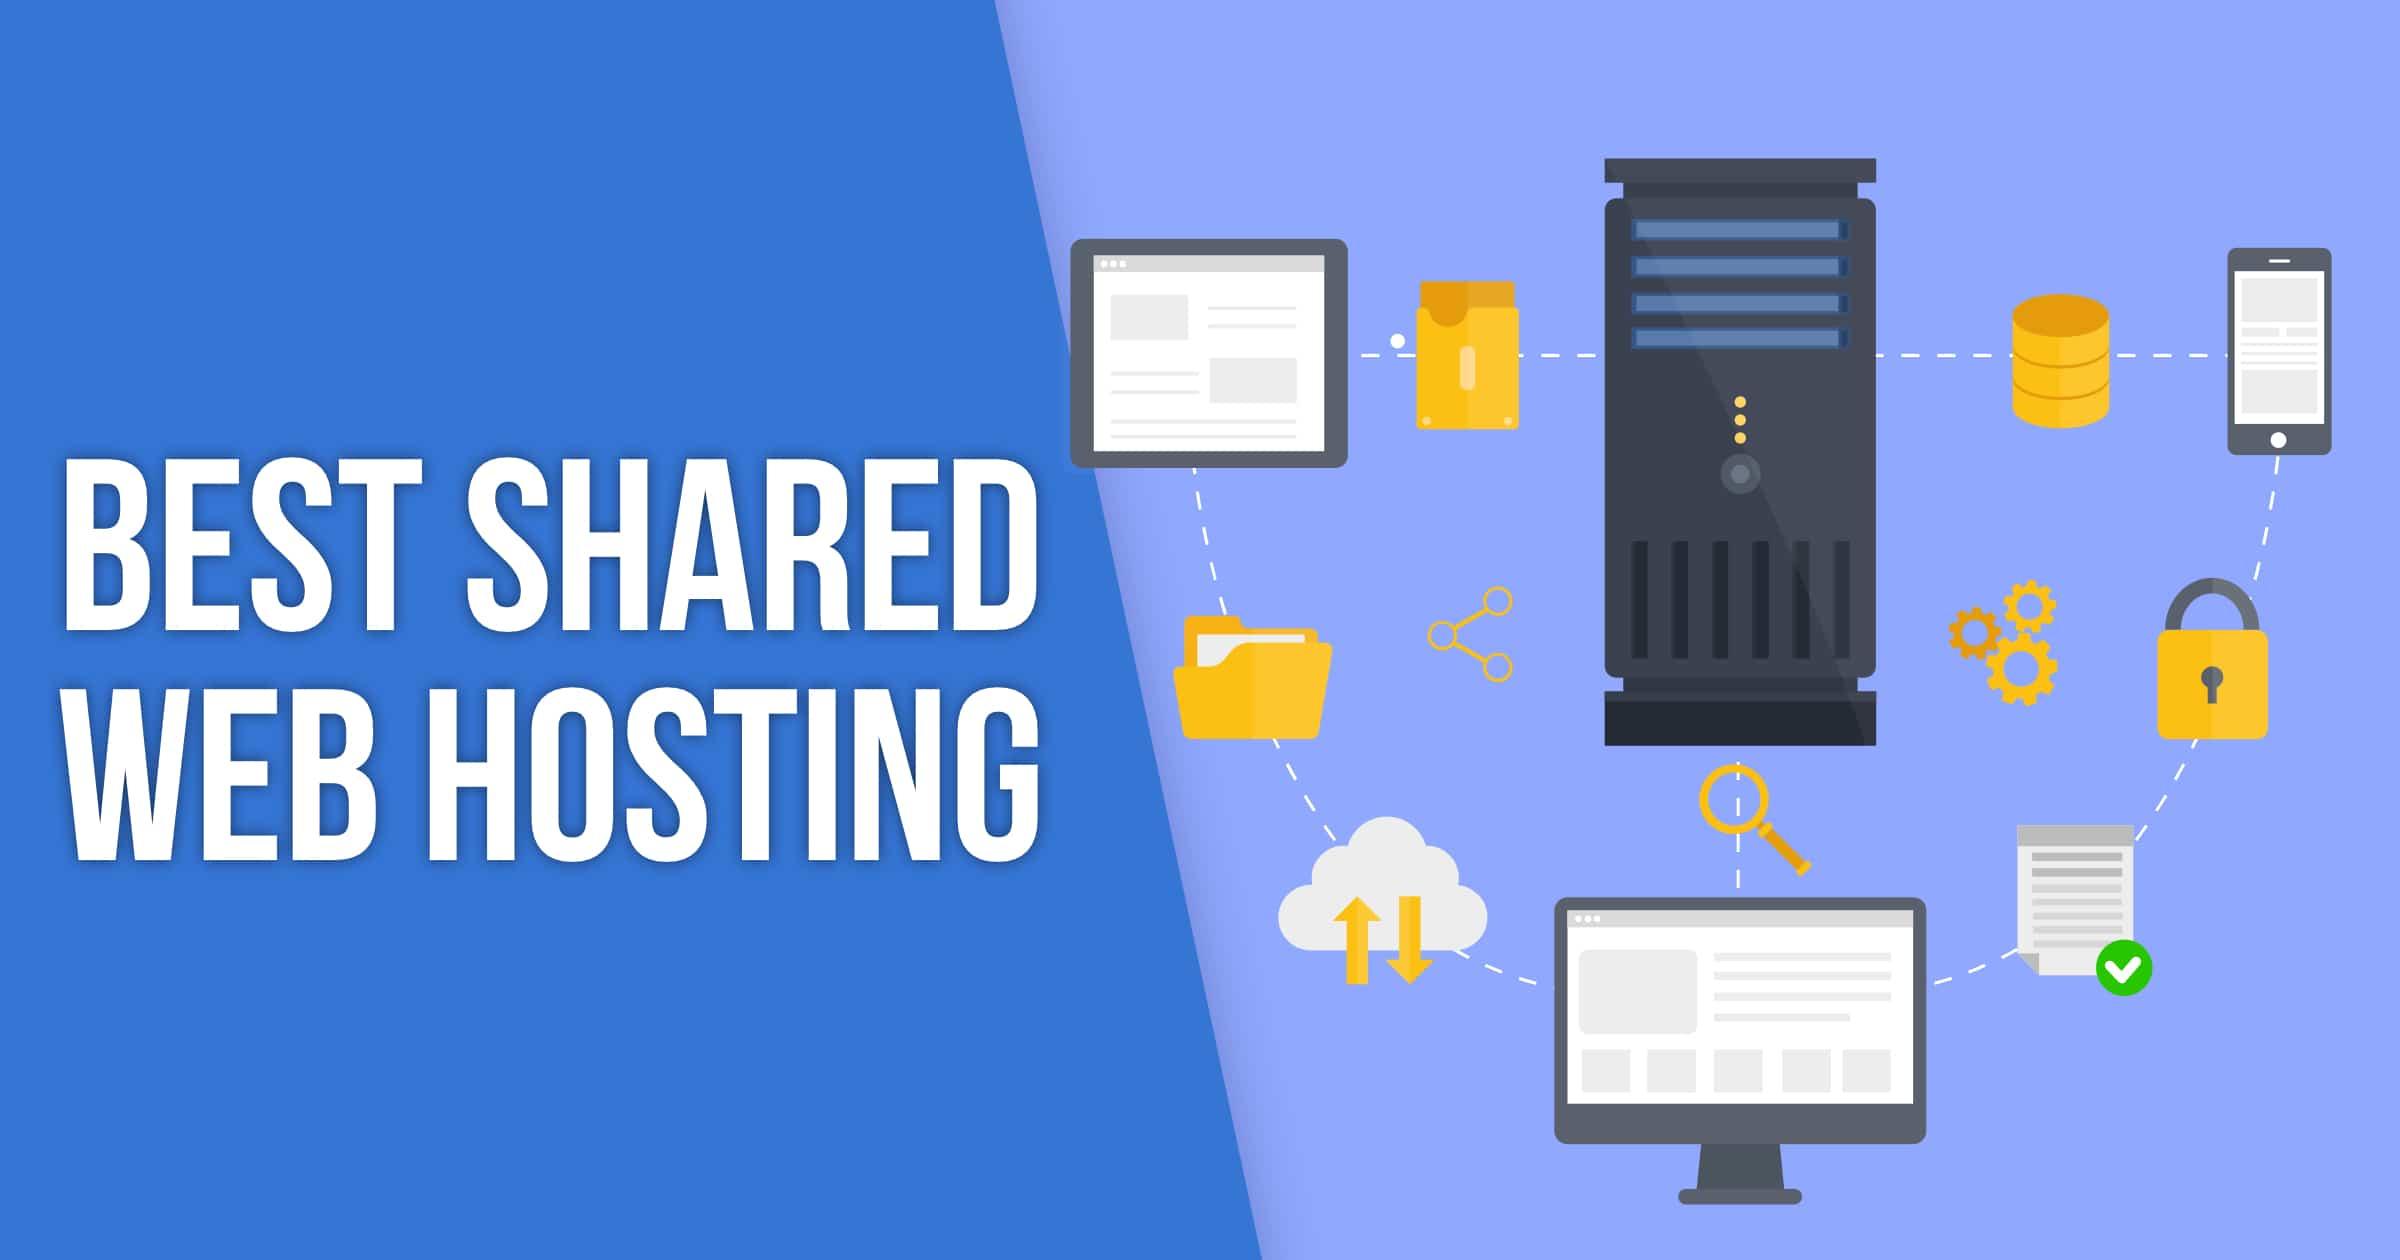 Get cheap shared web hosting, wordpress hosting